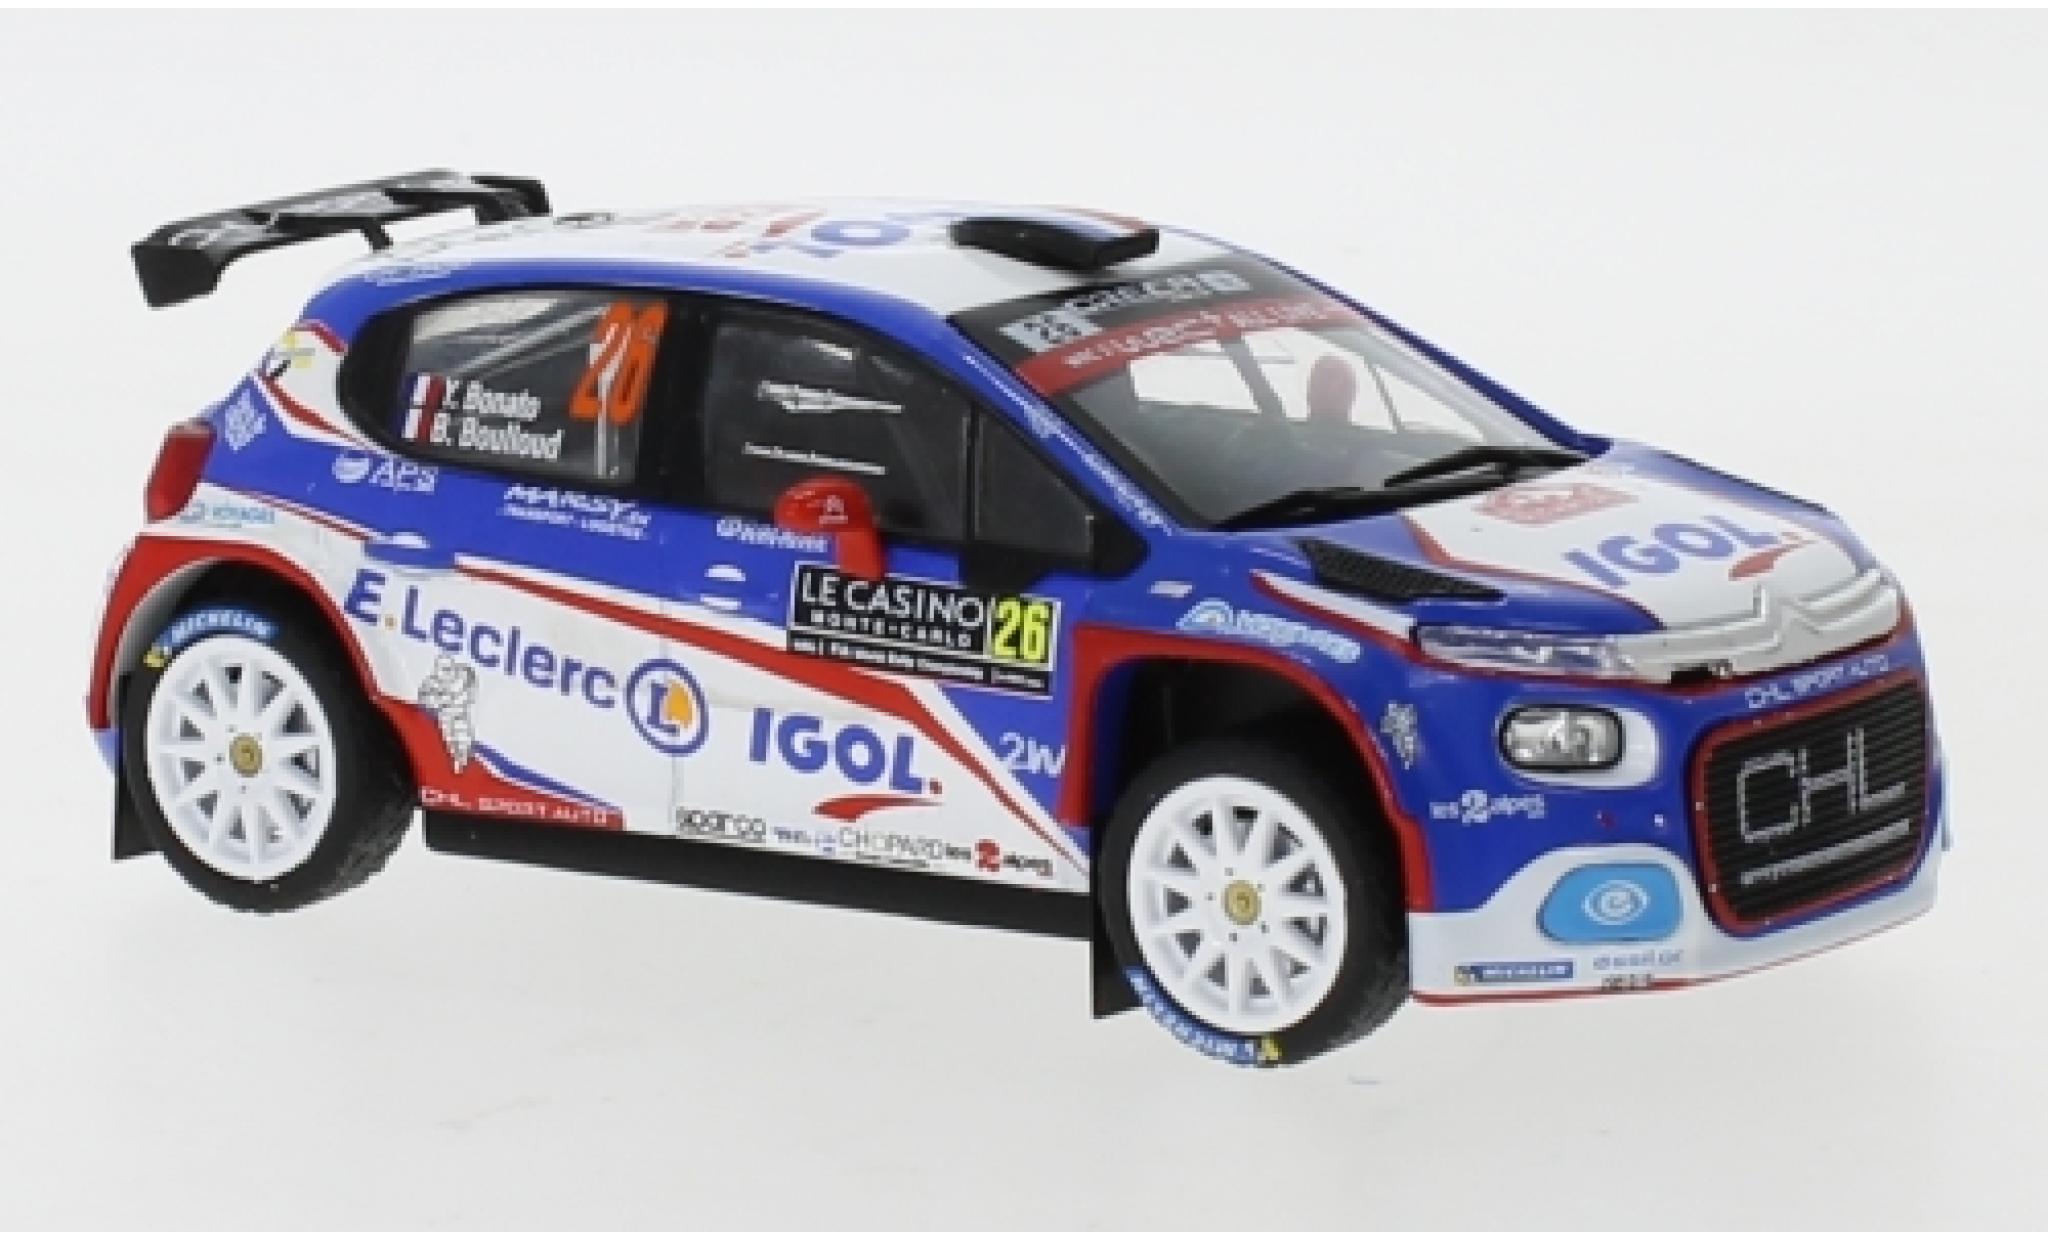 Citroen C3 1/43 IXO R5 No.26 Rallye WM Rallye Monte Carlo 2020 Y.Bonato/B.Boulloud